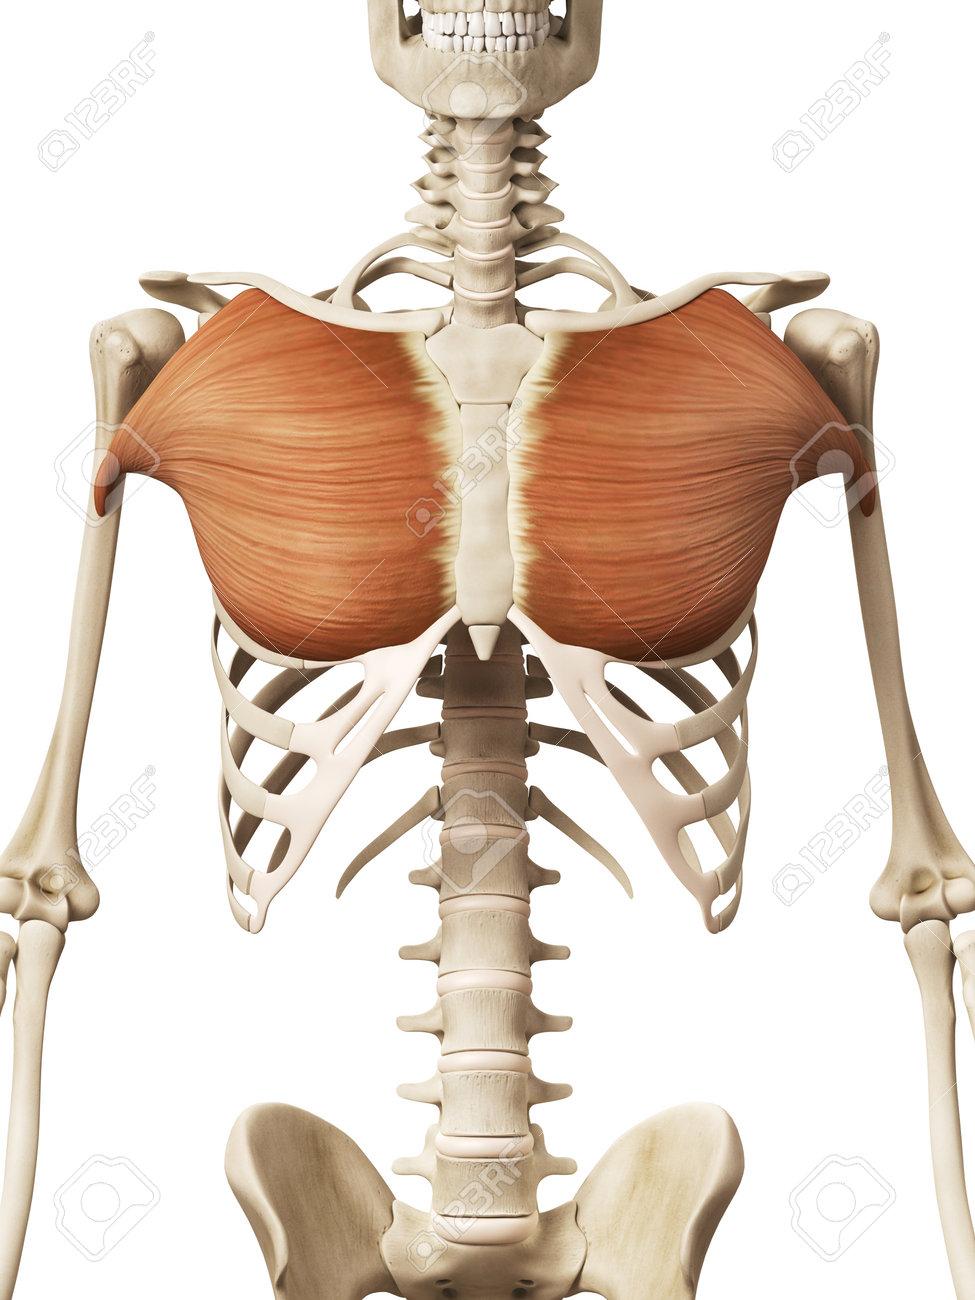 medium resolution of muscle anatomy the pectoralis major stock photo 32521312